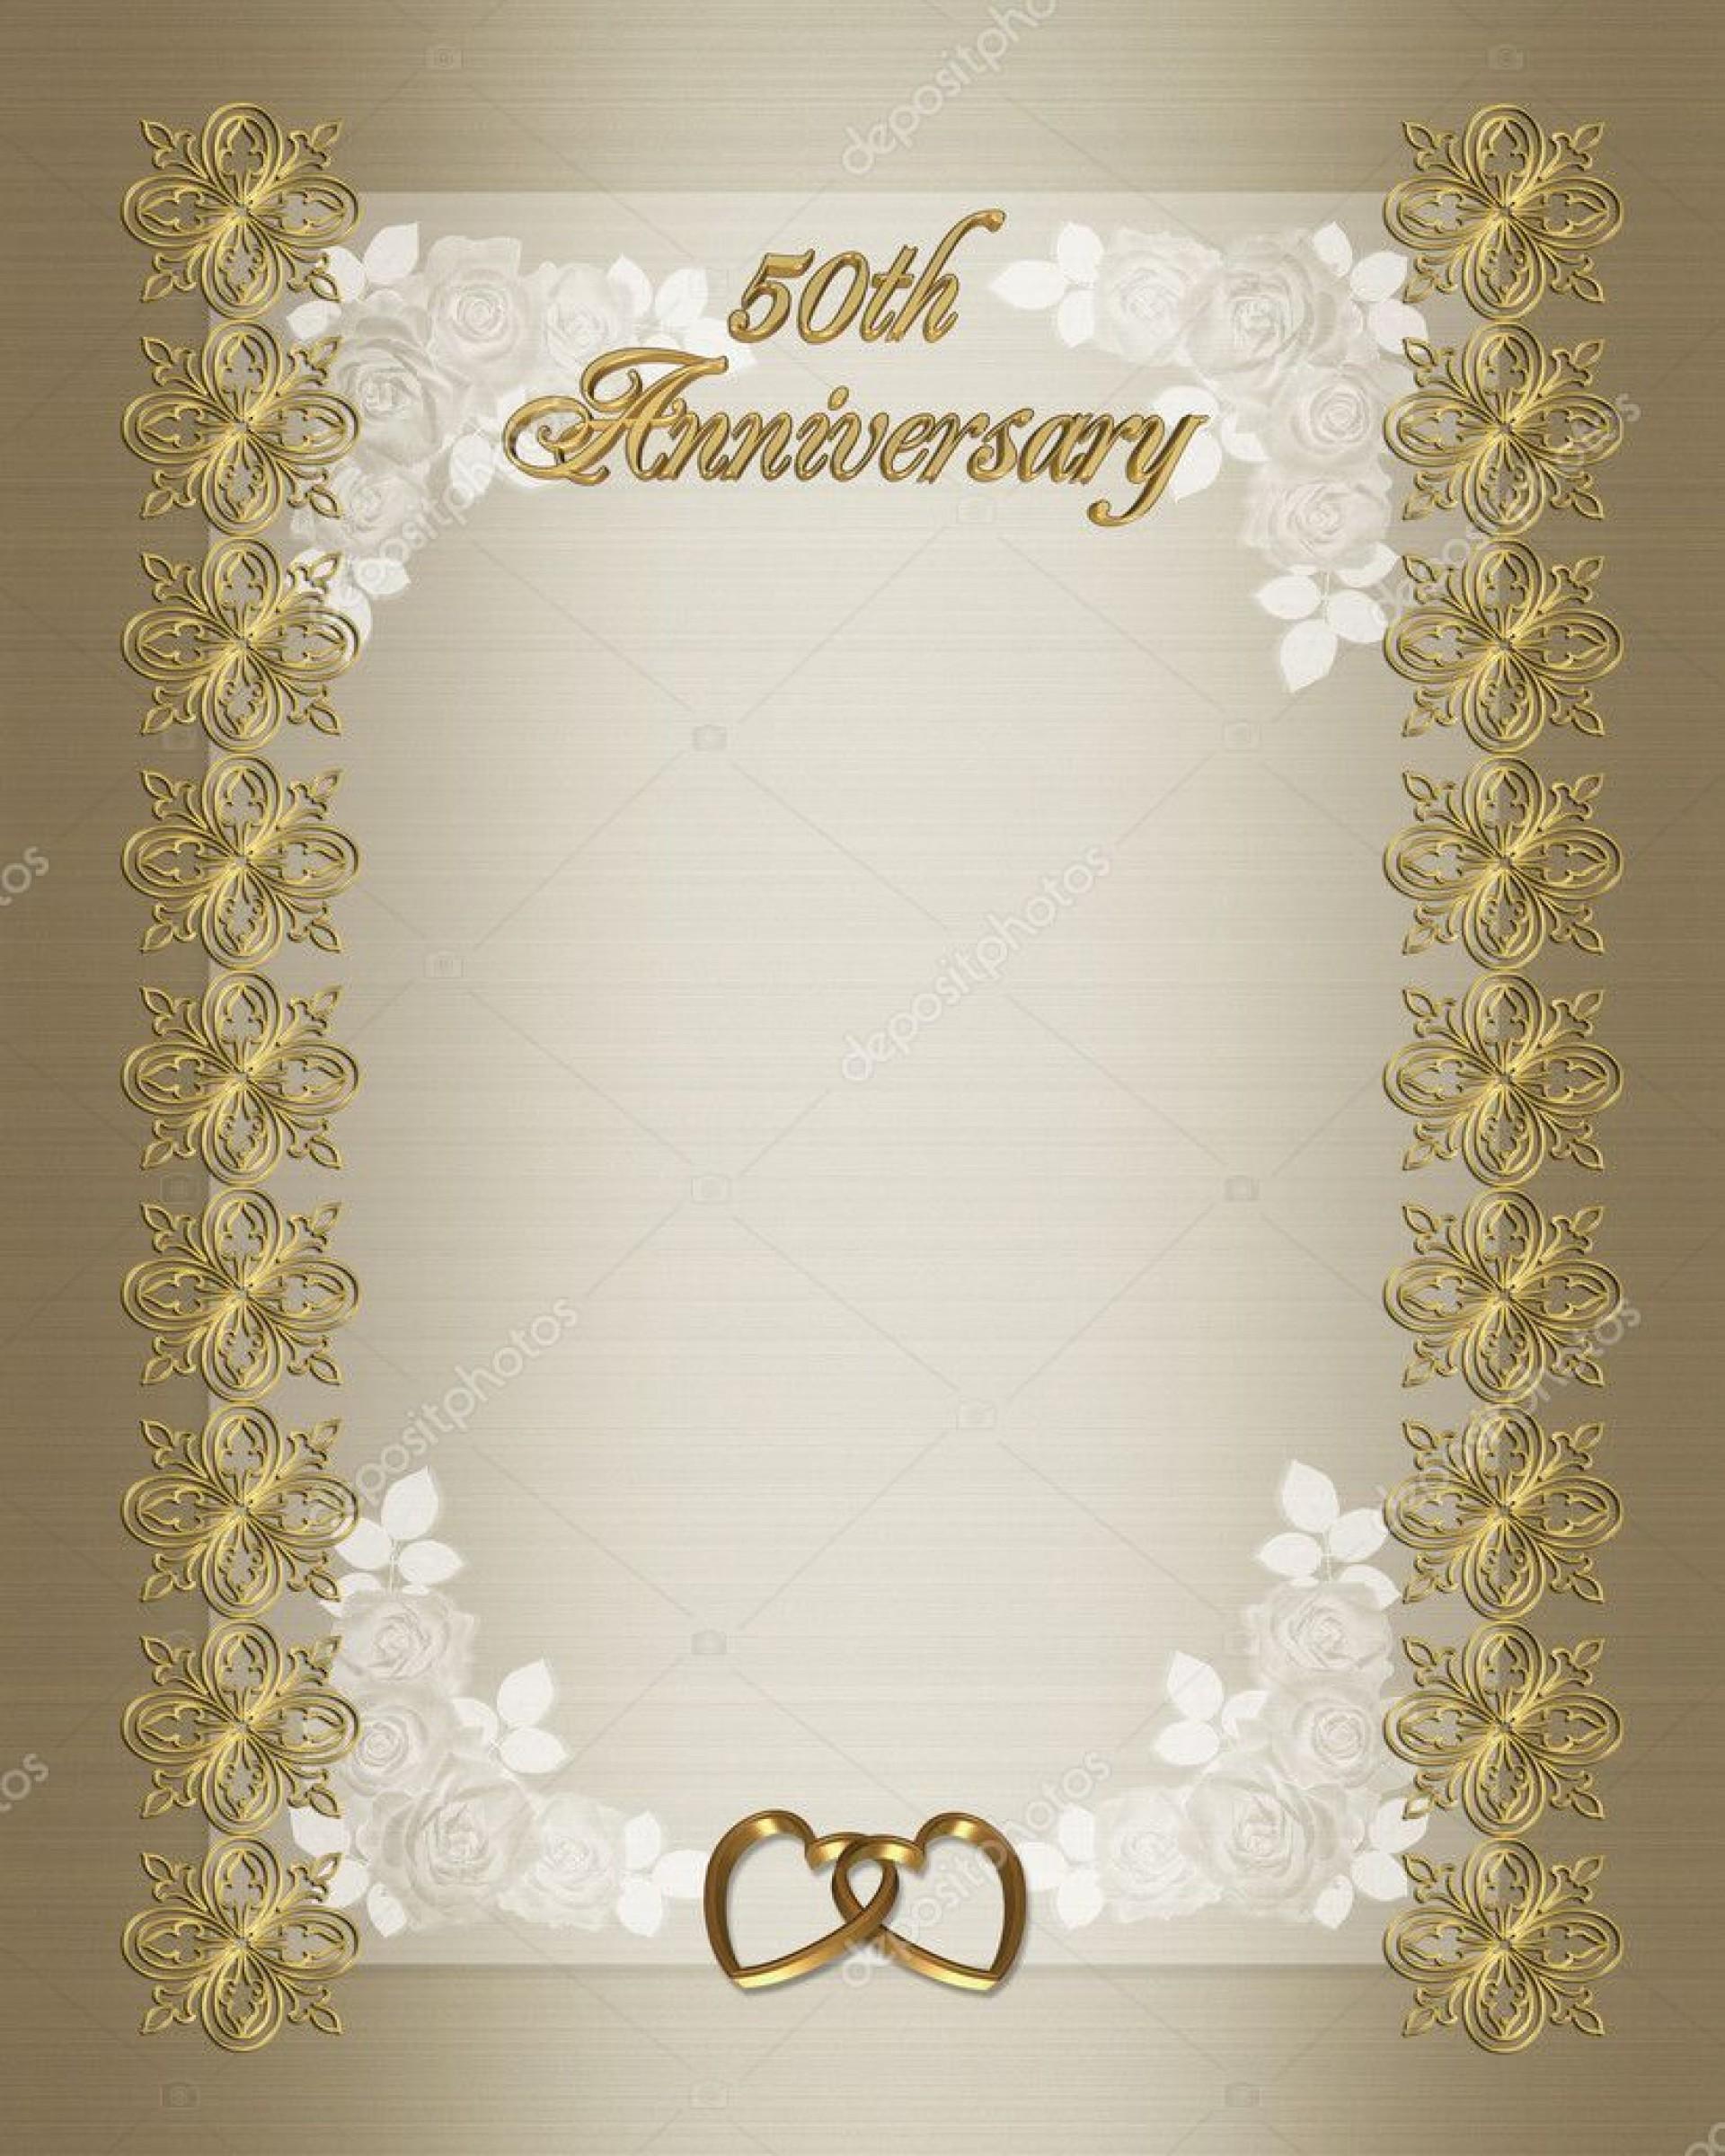 009 Top 50th Anniversary Invitation Card Template Photo  Templates Free1920